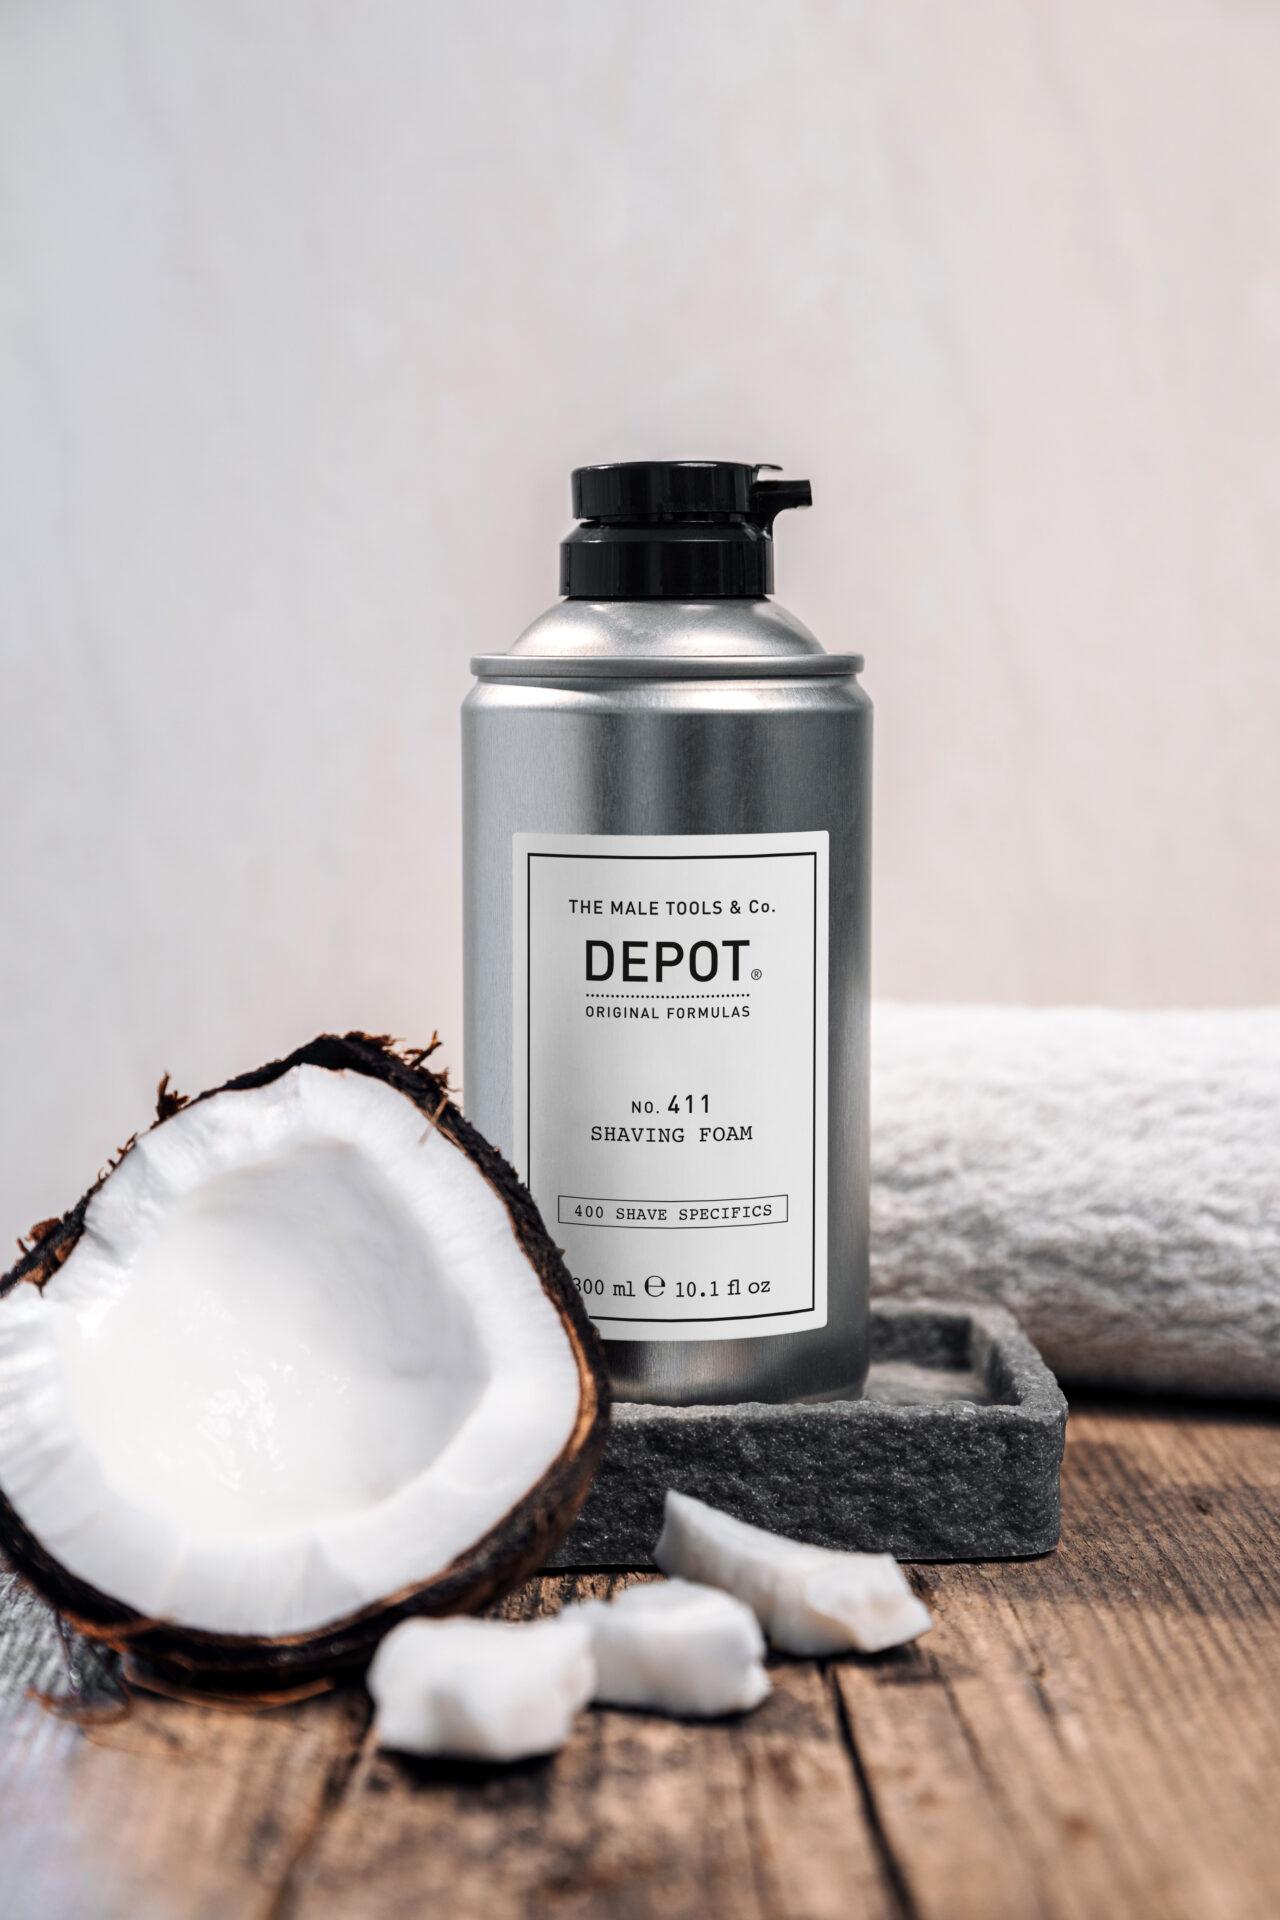 DEPOT 411 Shaving Foam